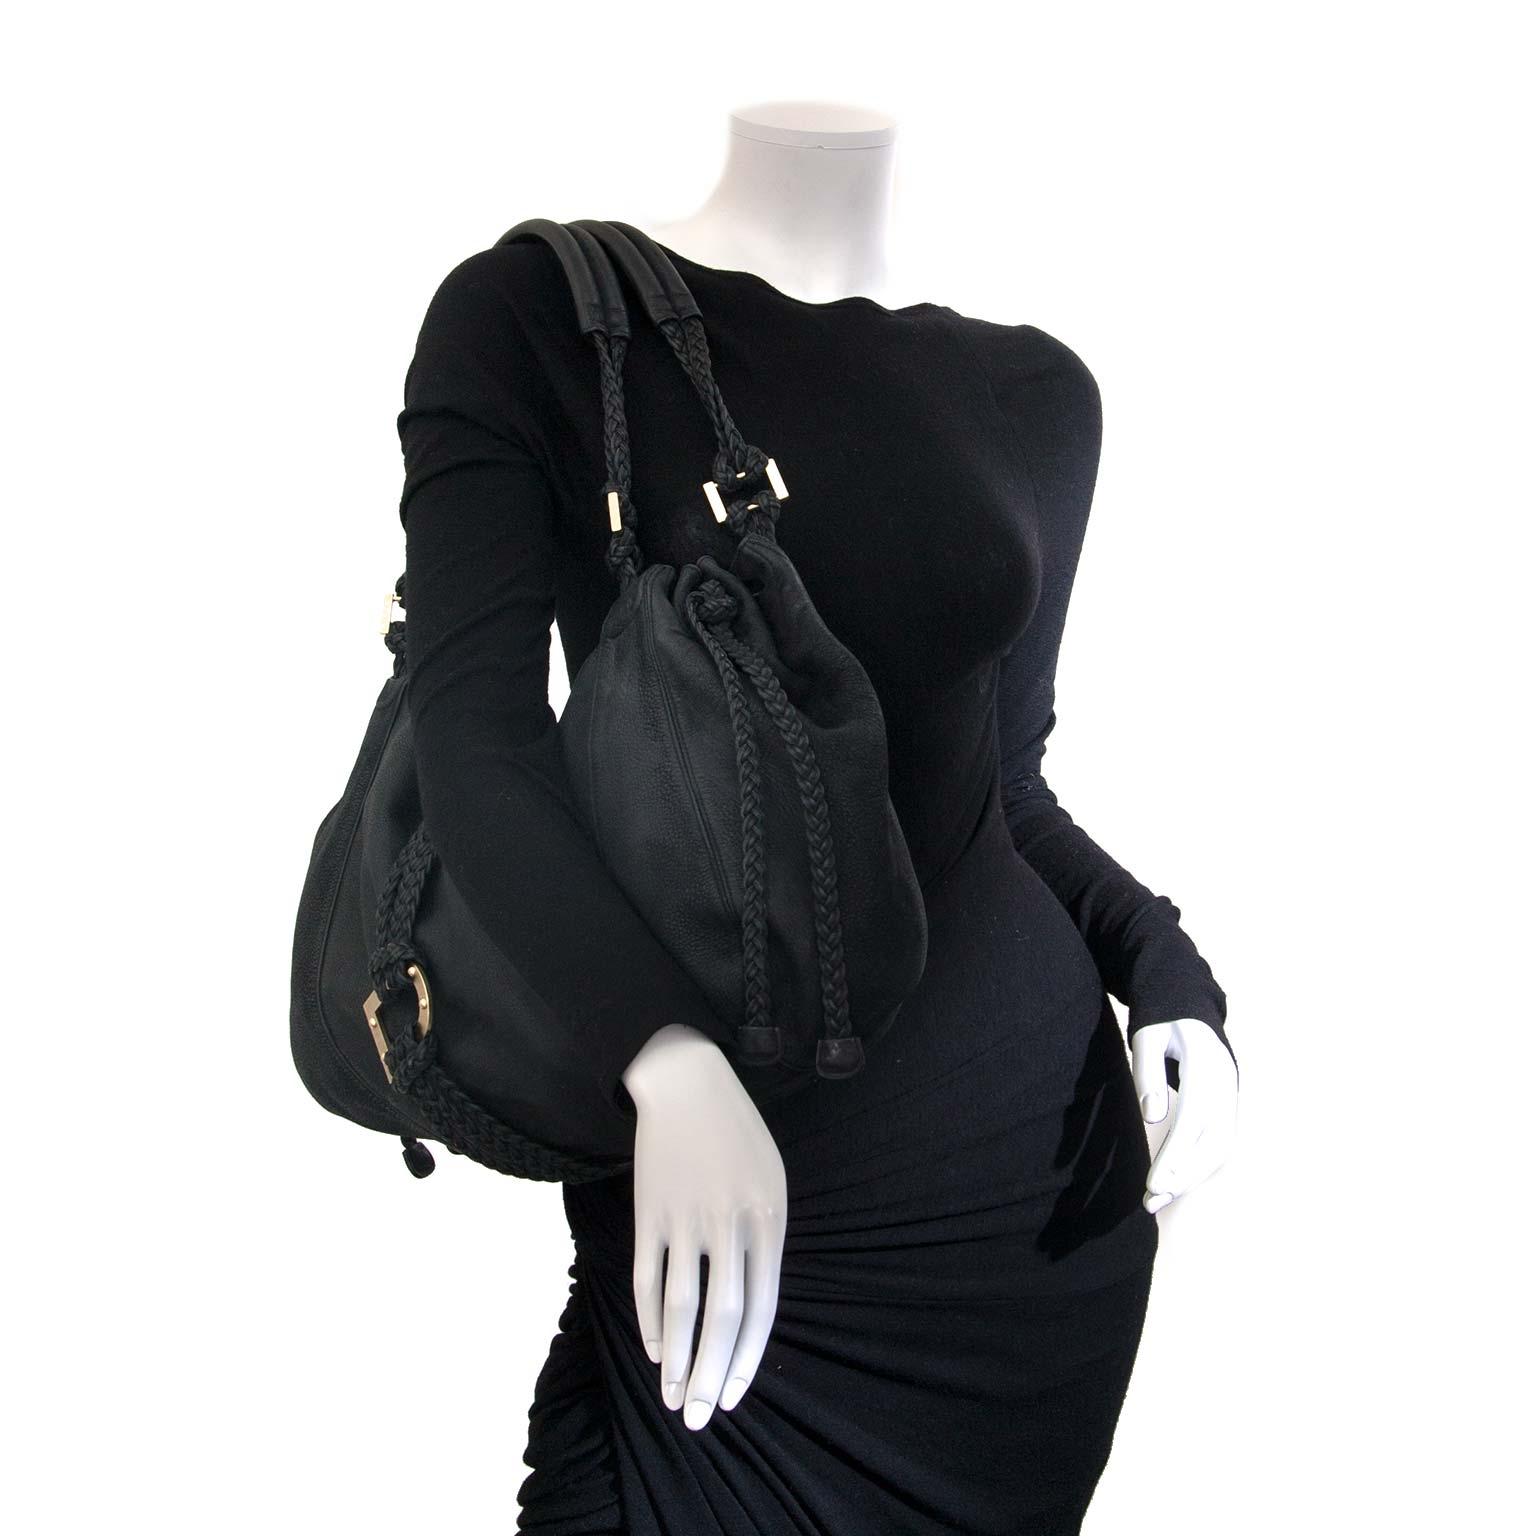 delvaux colette gm tas nu te koop bij labellov vintage mode webshop belgië